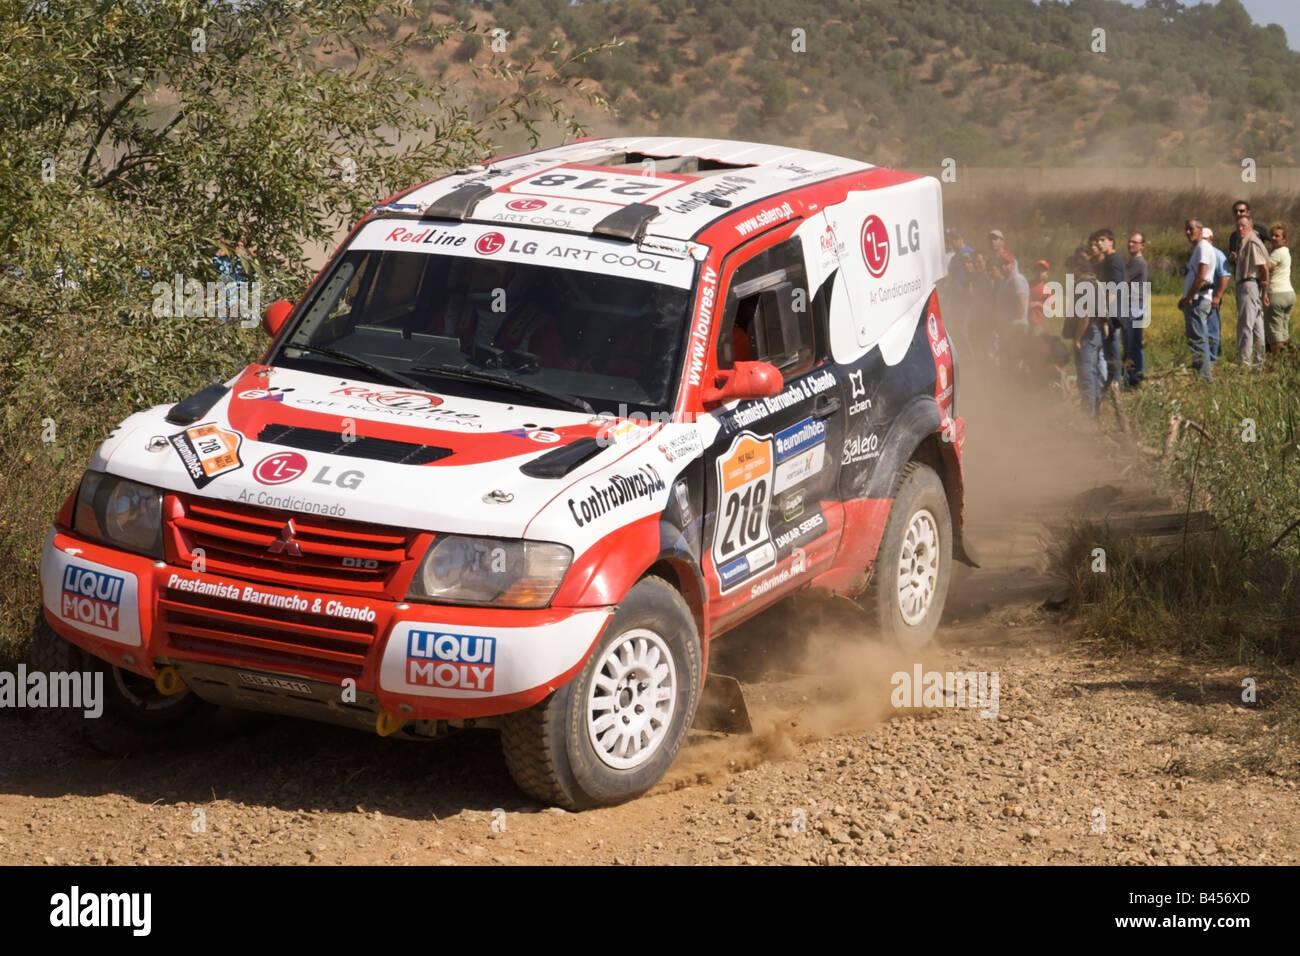 Pax-Rallye - Lisboa-Portimão - Dakar-Serie - Auto 218 - Team - Redline, Francisco Inocêncio und Paulo Fiuza Stockfoto